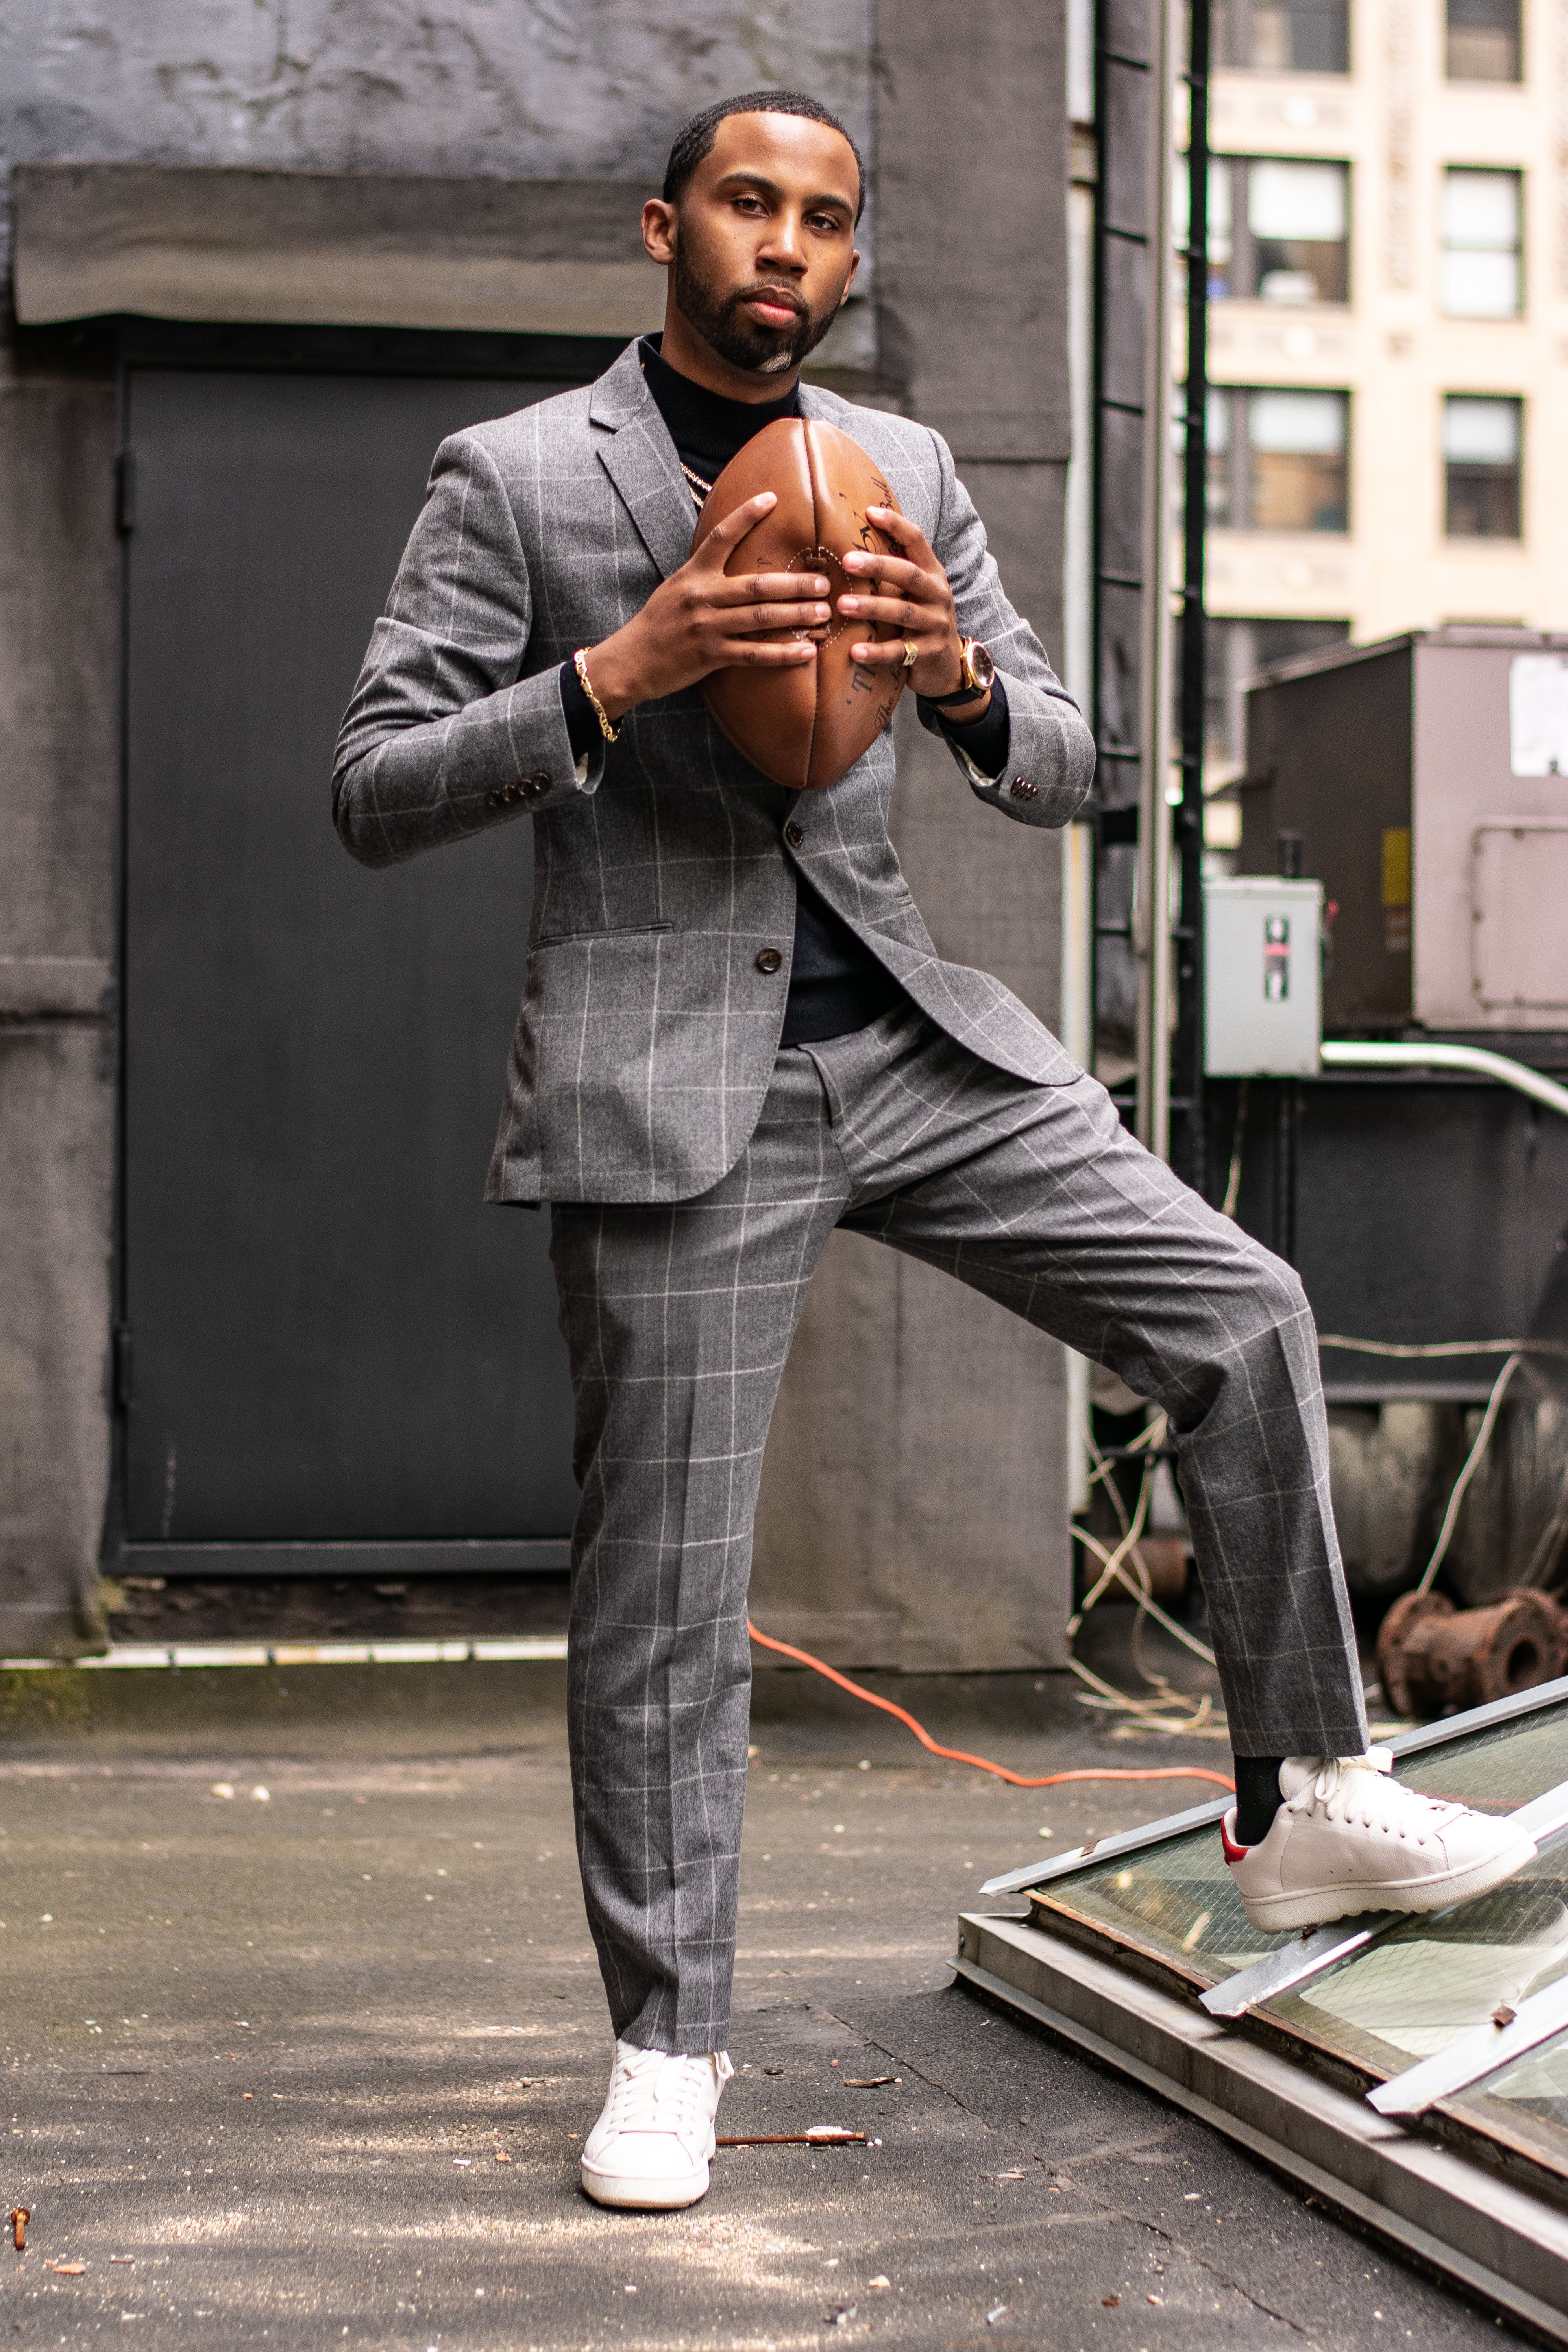 Man Wearing Grey Tuxedo Holding American Football